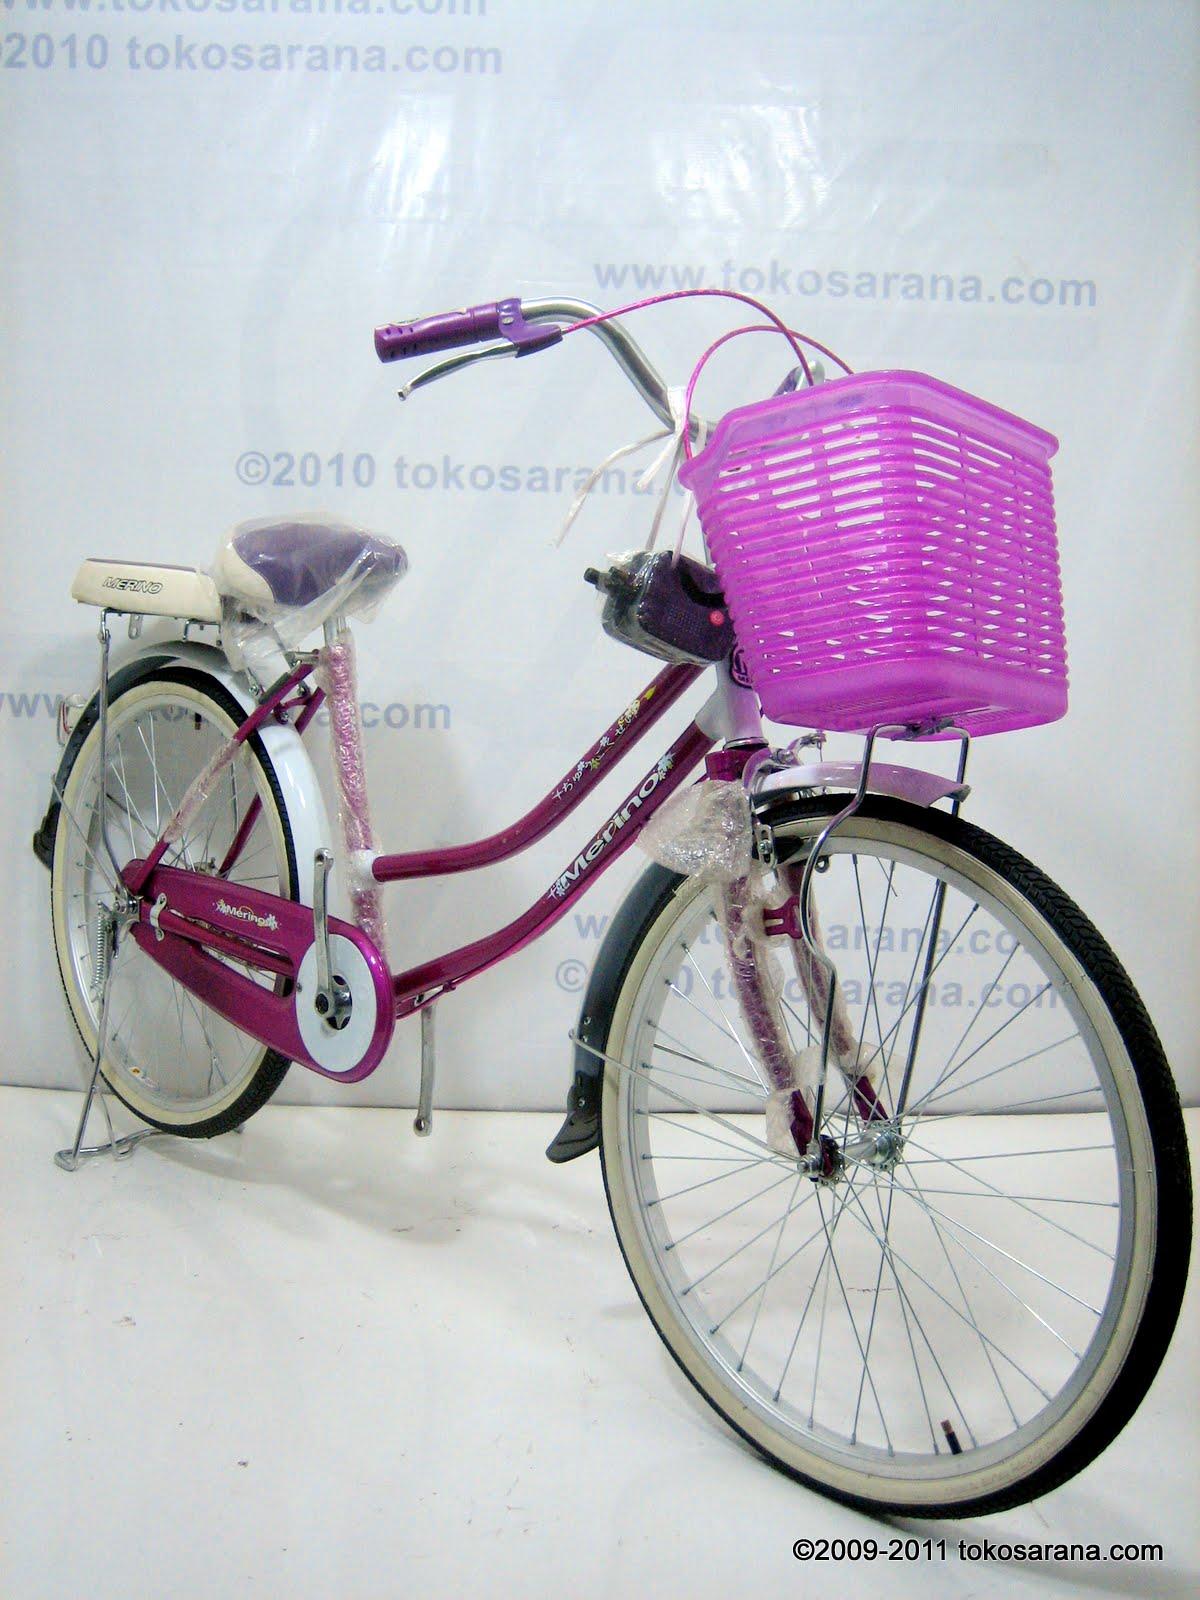 tokomagenta: A Showcase of Products: Sepeda Mini MERINO